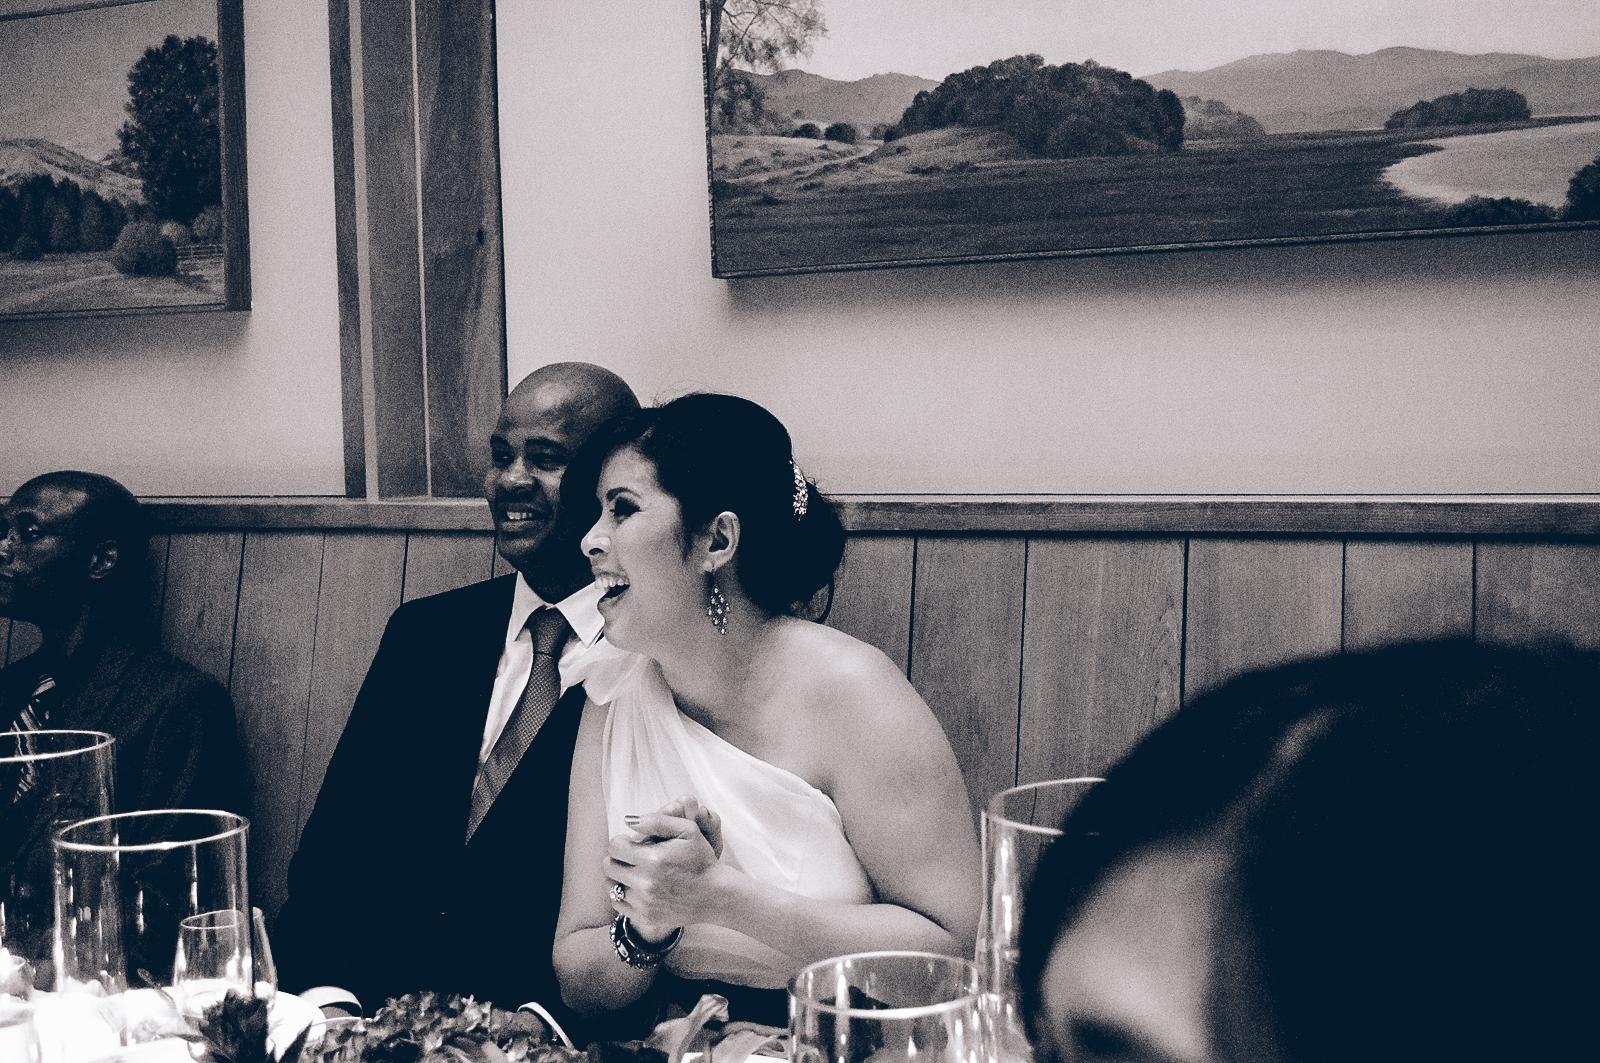 greens_restaurant_wedding_photography_san_franscisco_ebony_siovhan_bokeh_photography_73.jpg